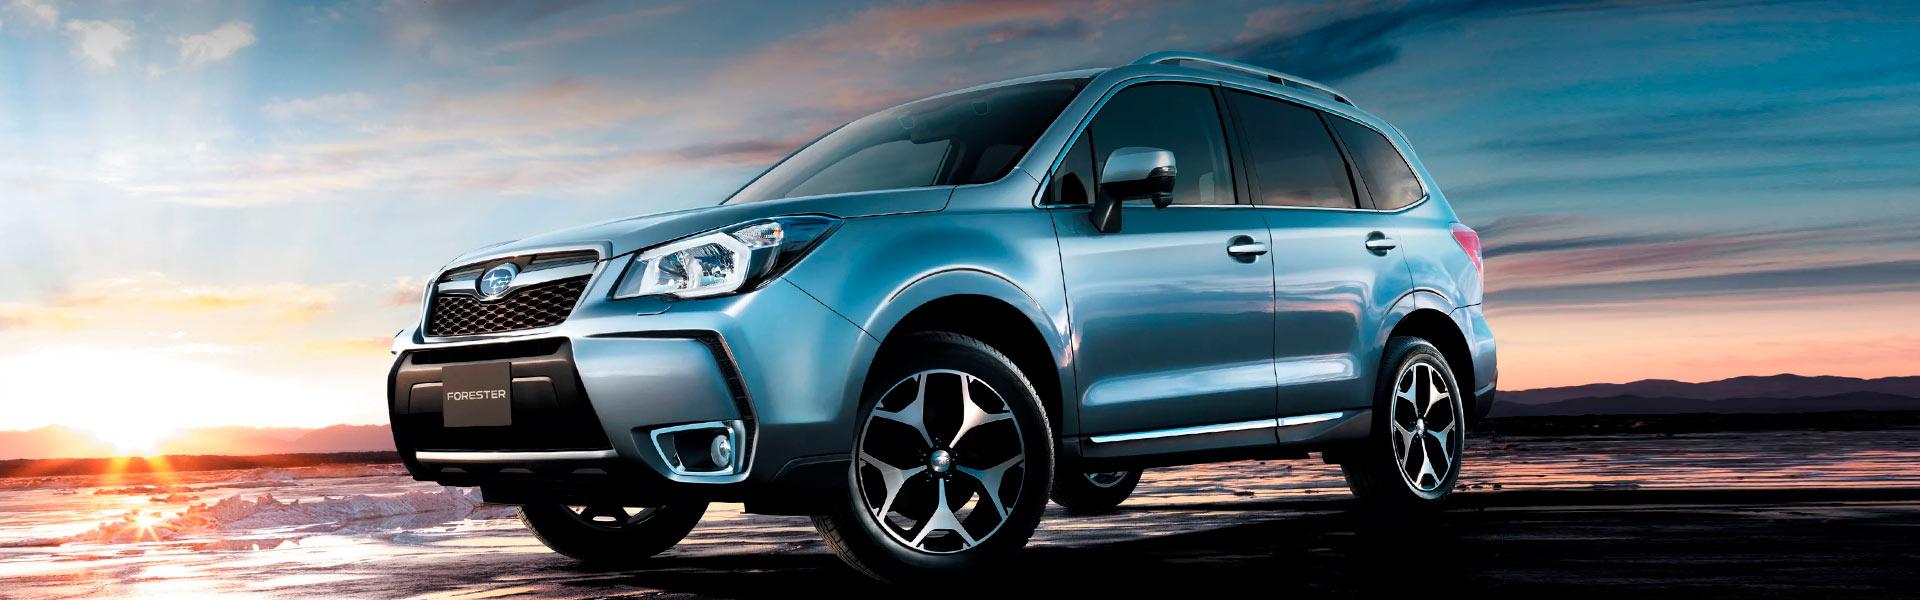 Запчасти на Subaru